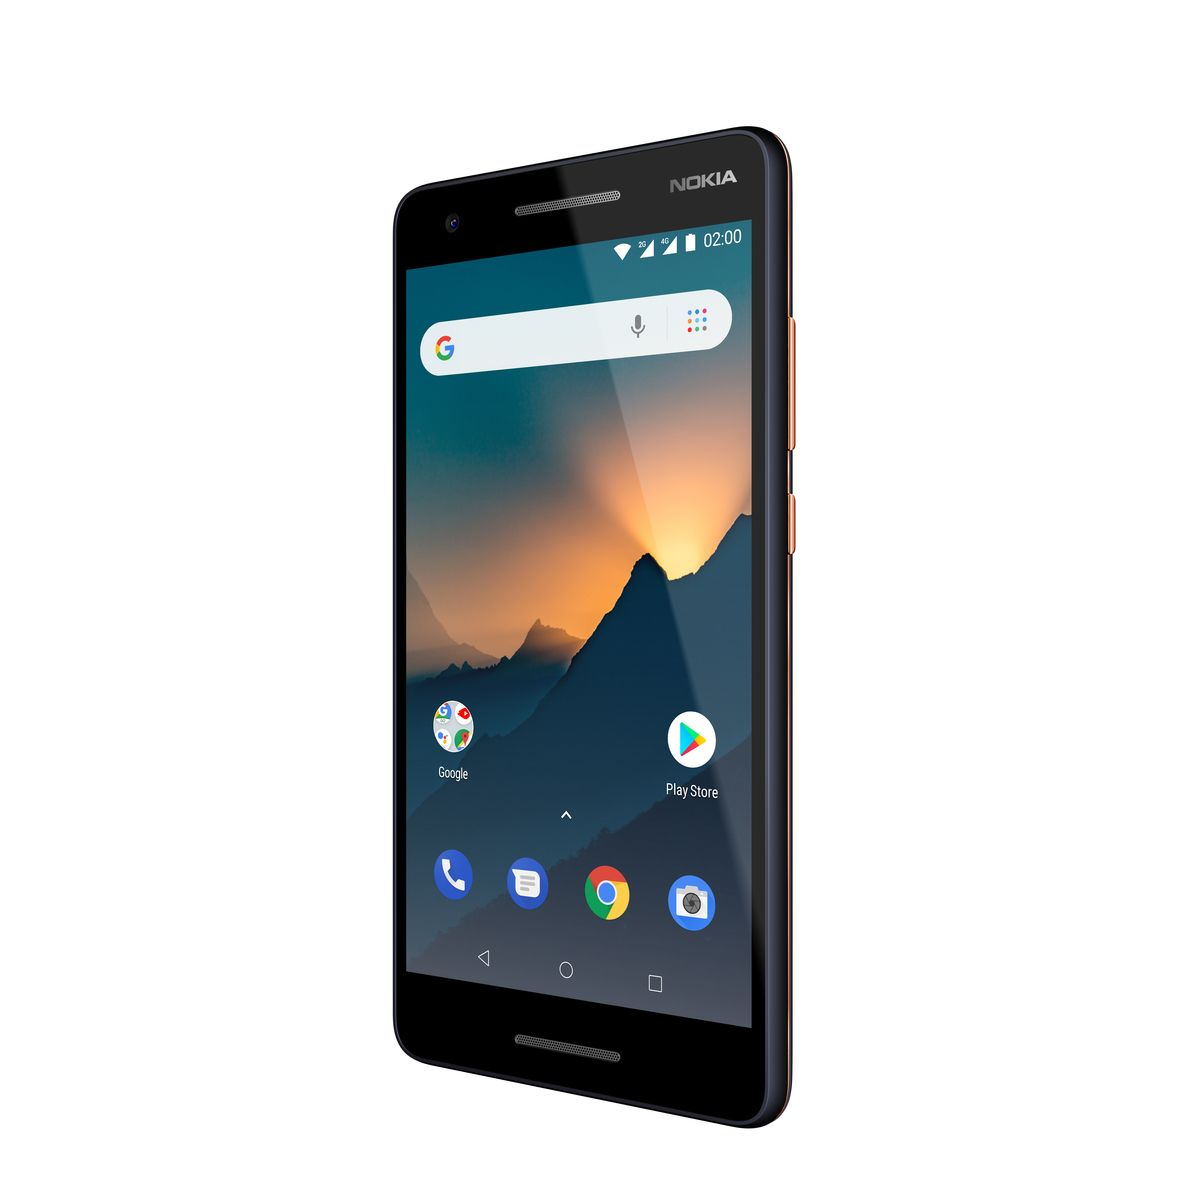 NOKIA Smartphone - 2.1 - 8 Go - Bleu cuivre - Double SIM - 4G